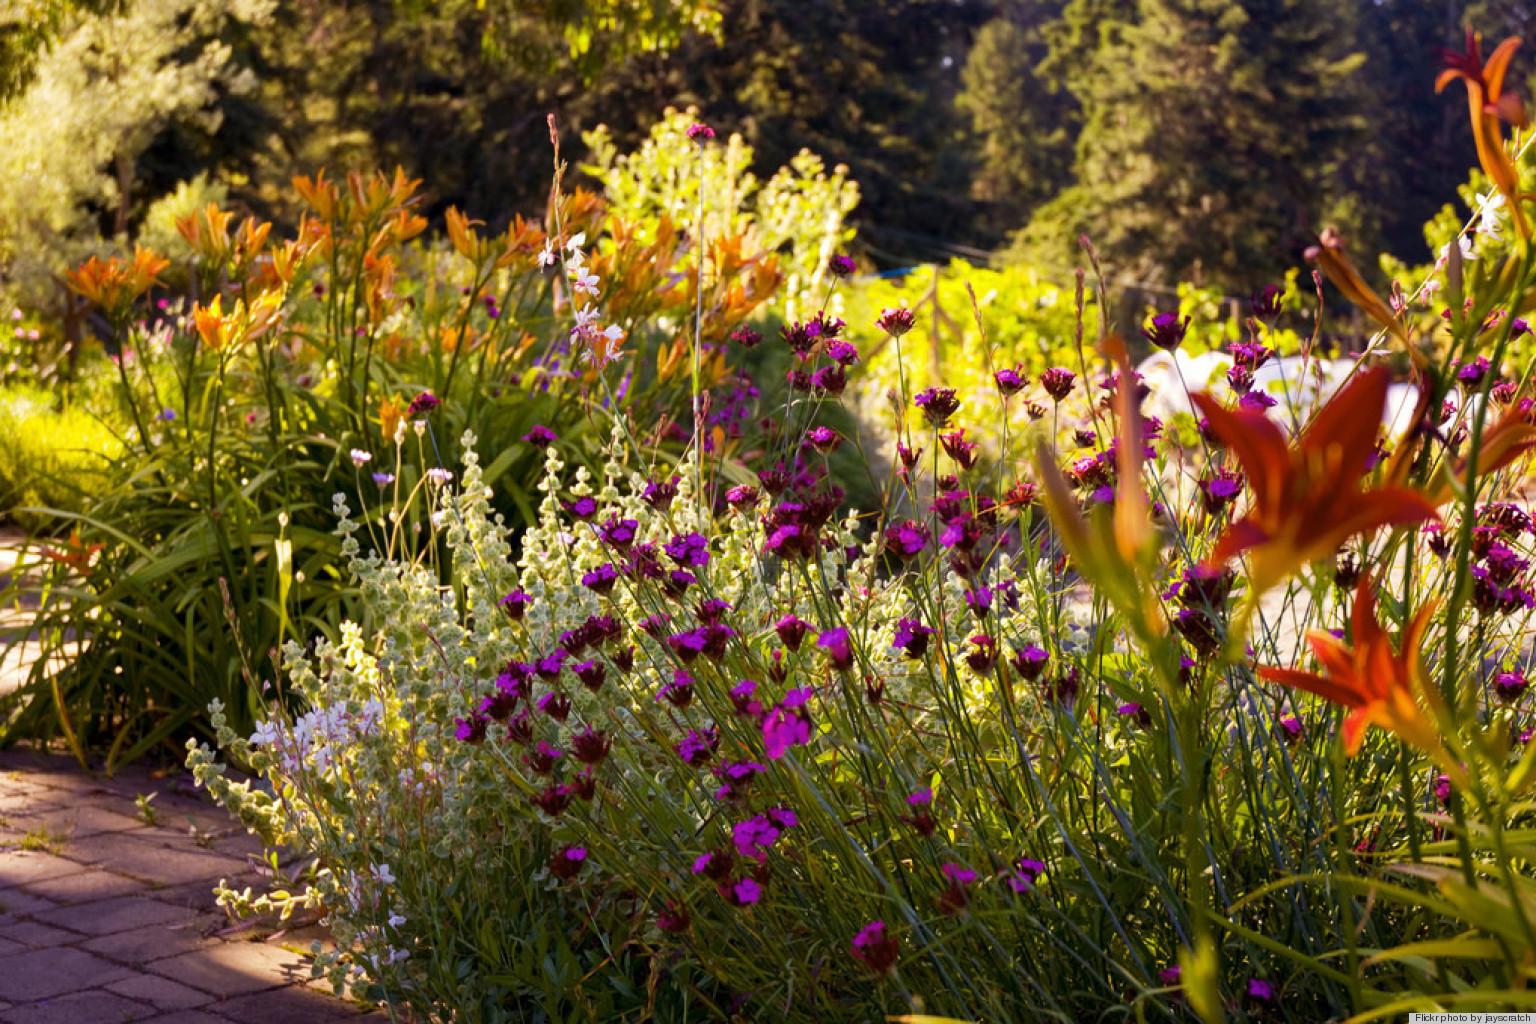 Gorgeous Garden Photos That Are Making Us Crave Spring (PHOTOS ...